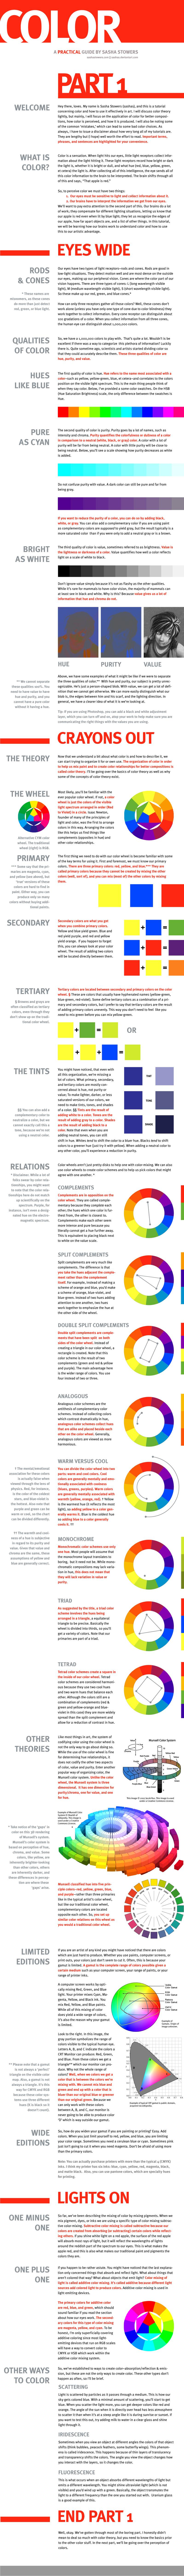 The Color Tutorial - Part 1